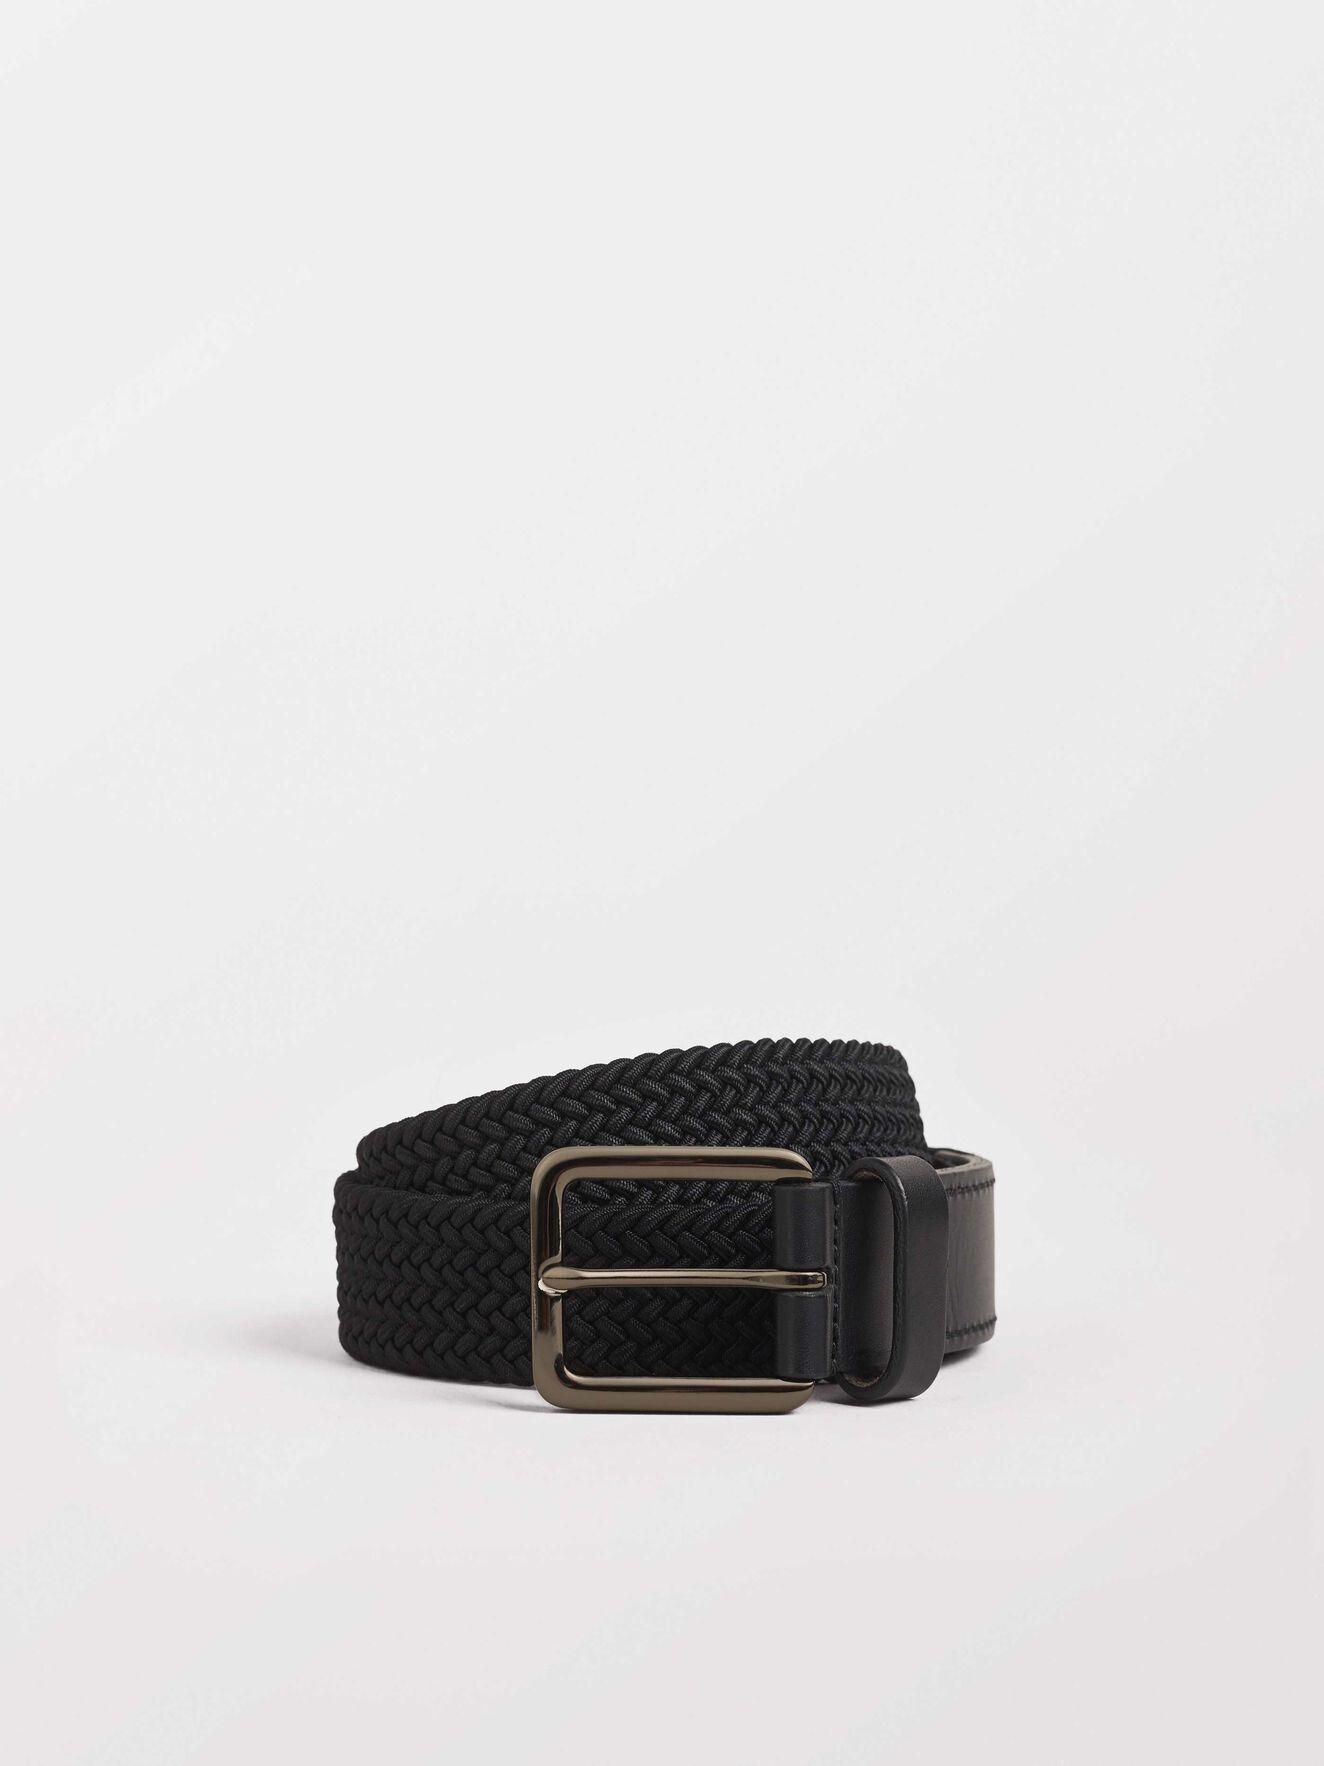 Braidant E Belt in Black from Tiger of Sweden